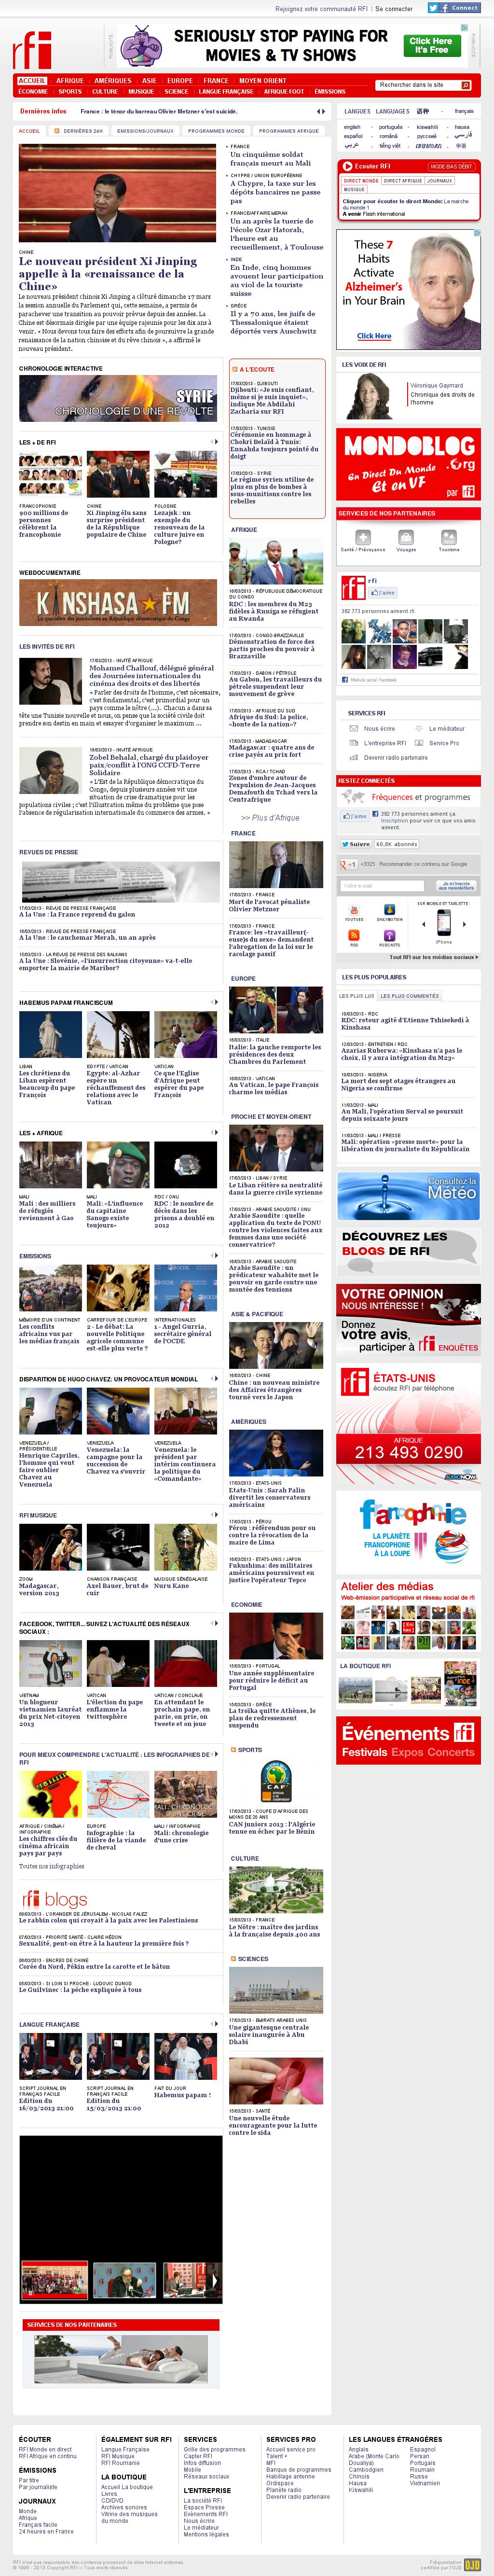 RFI at Sunday March 17, 2013, 2:24 p.m. UTC